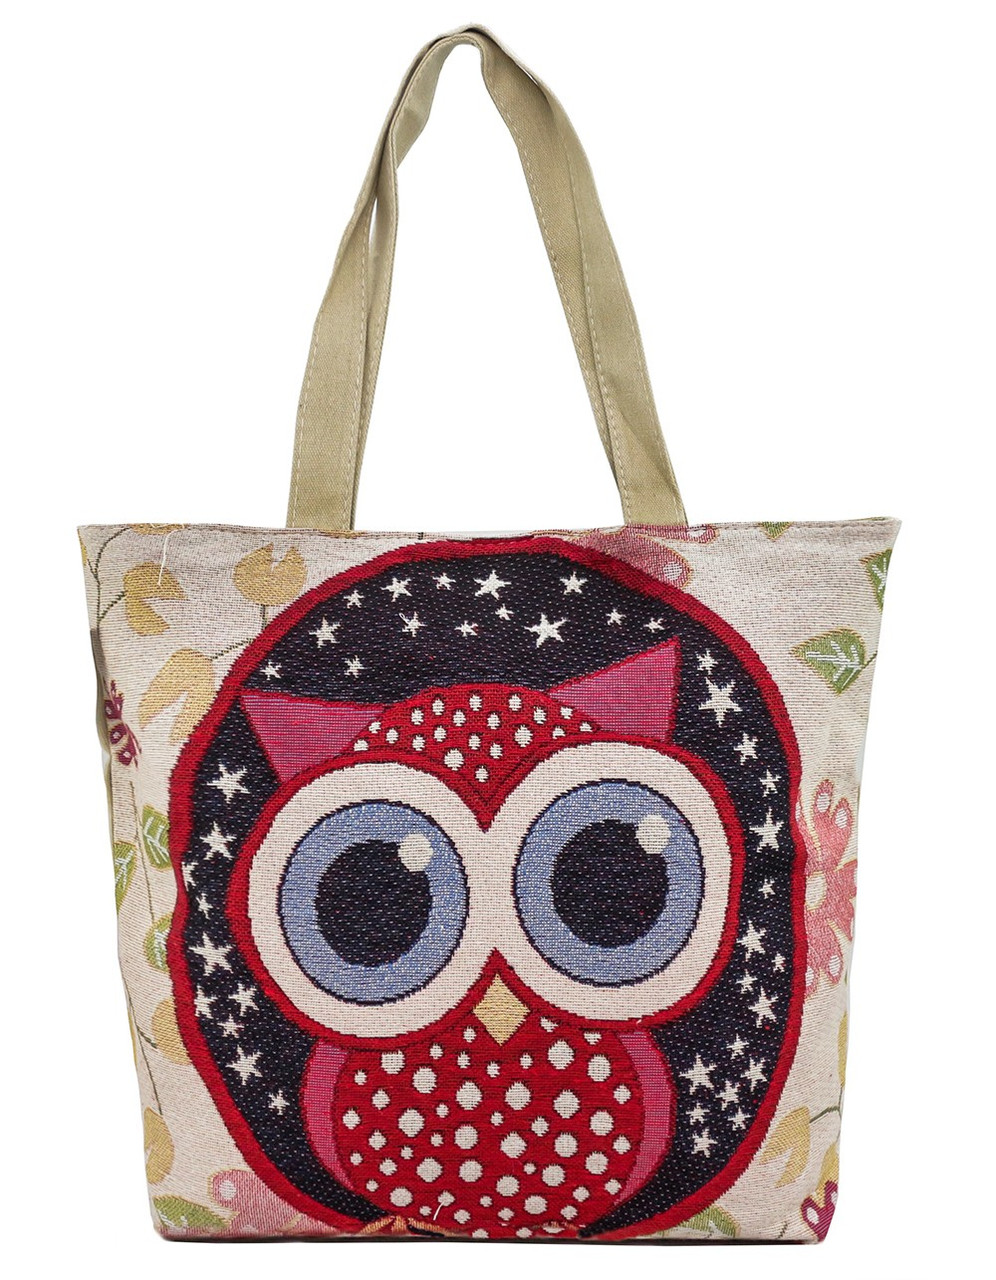 baee9b93f3a4 Пляжная тканевая сумка с принтом OK-03-85 - Arion-store - кожгалантерея